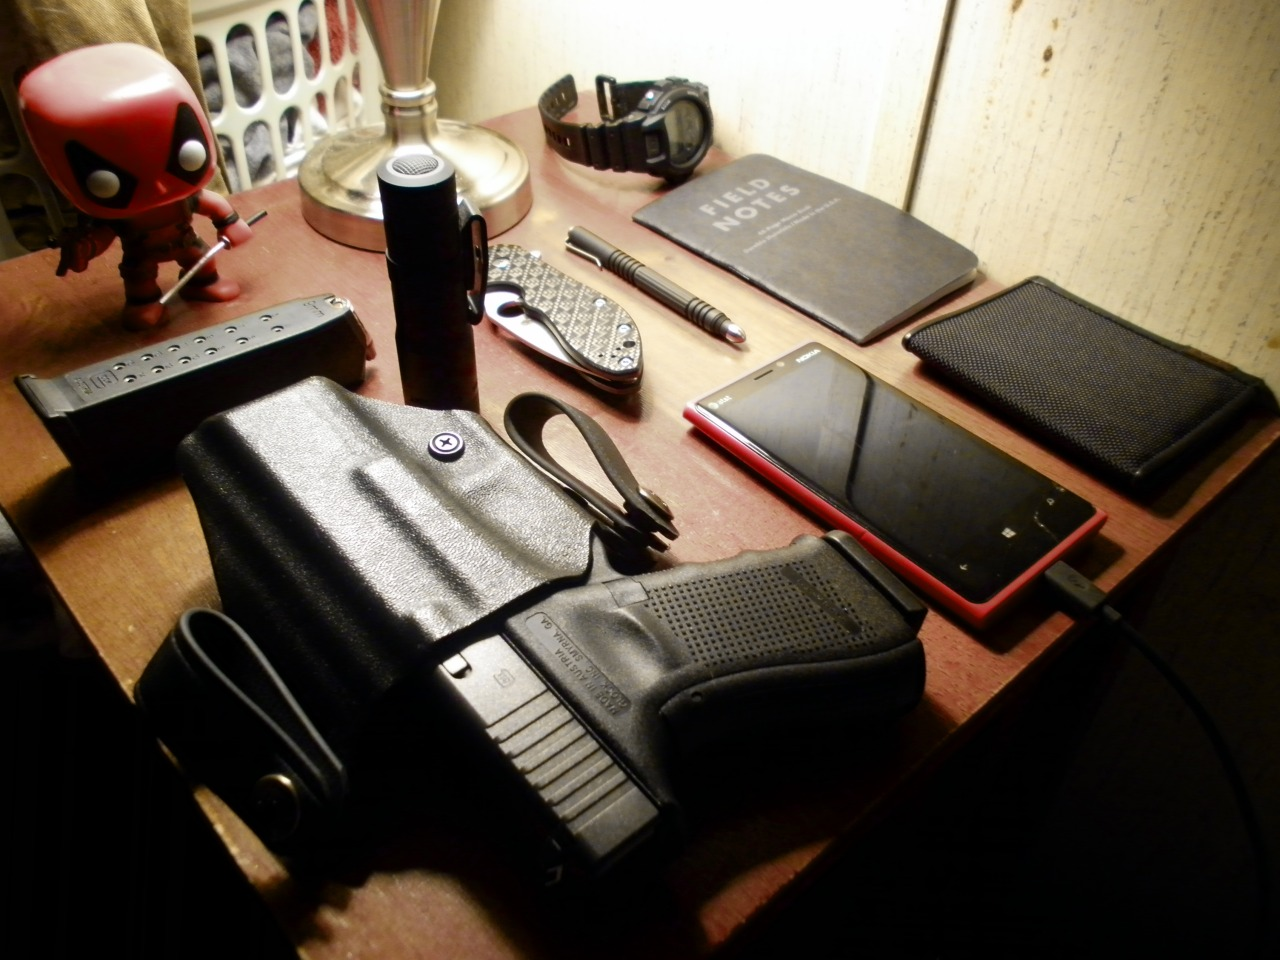 codenamedeadpool: The nightstand.